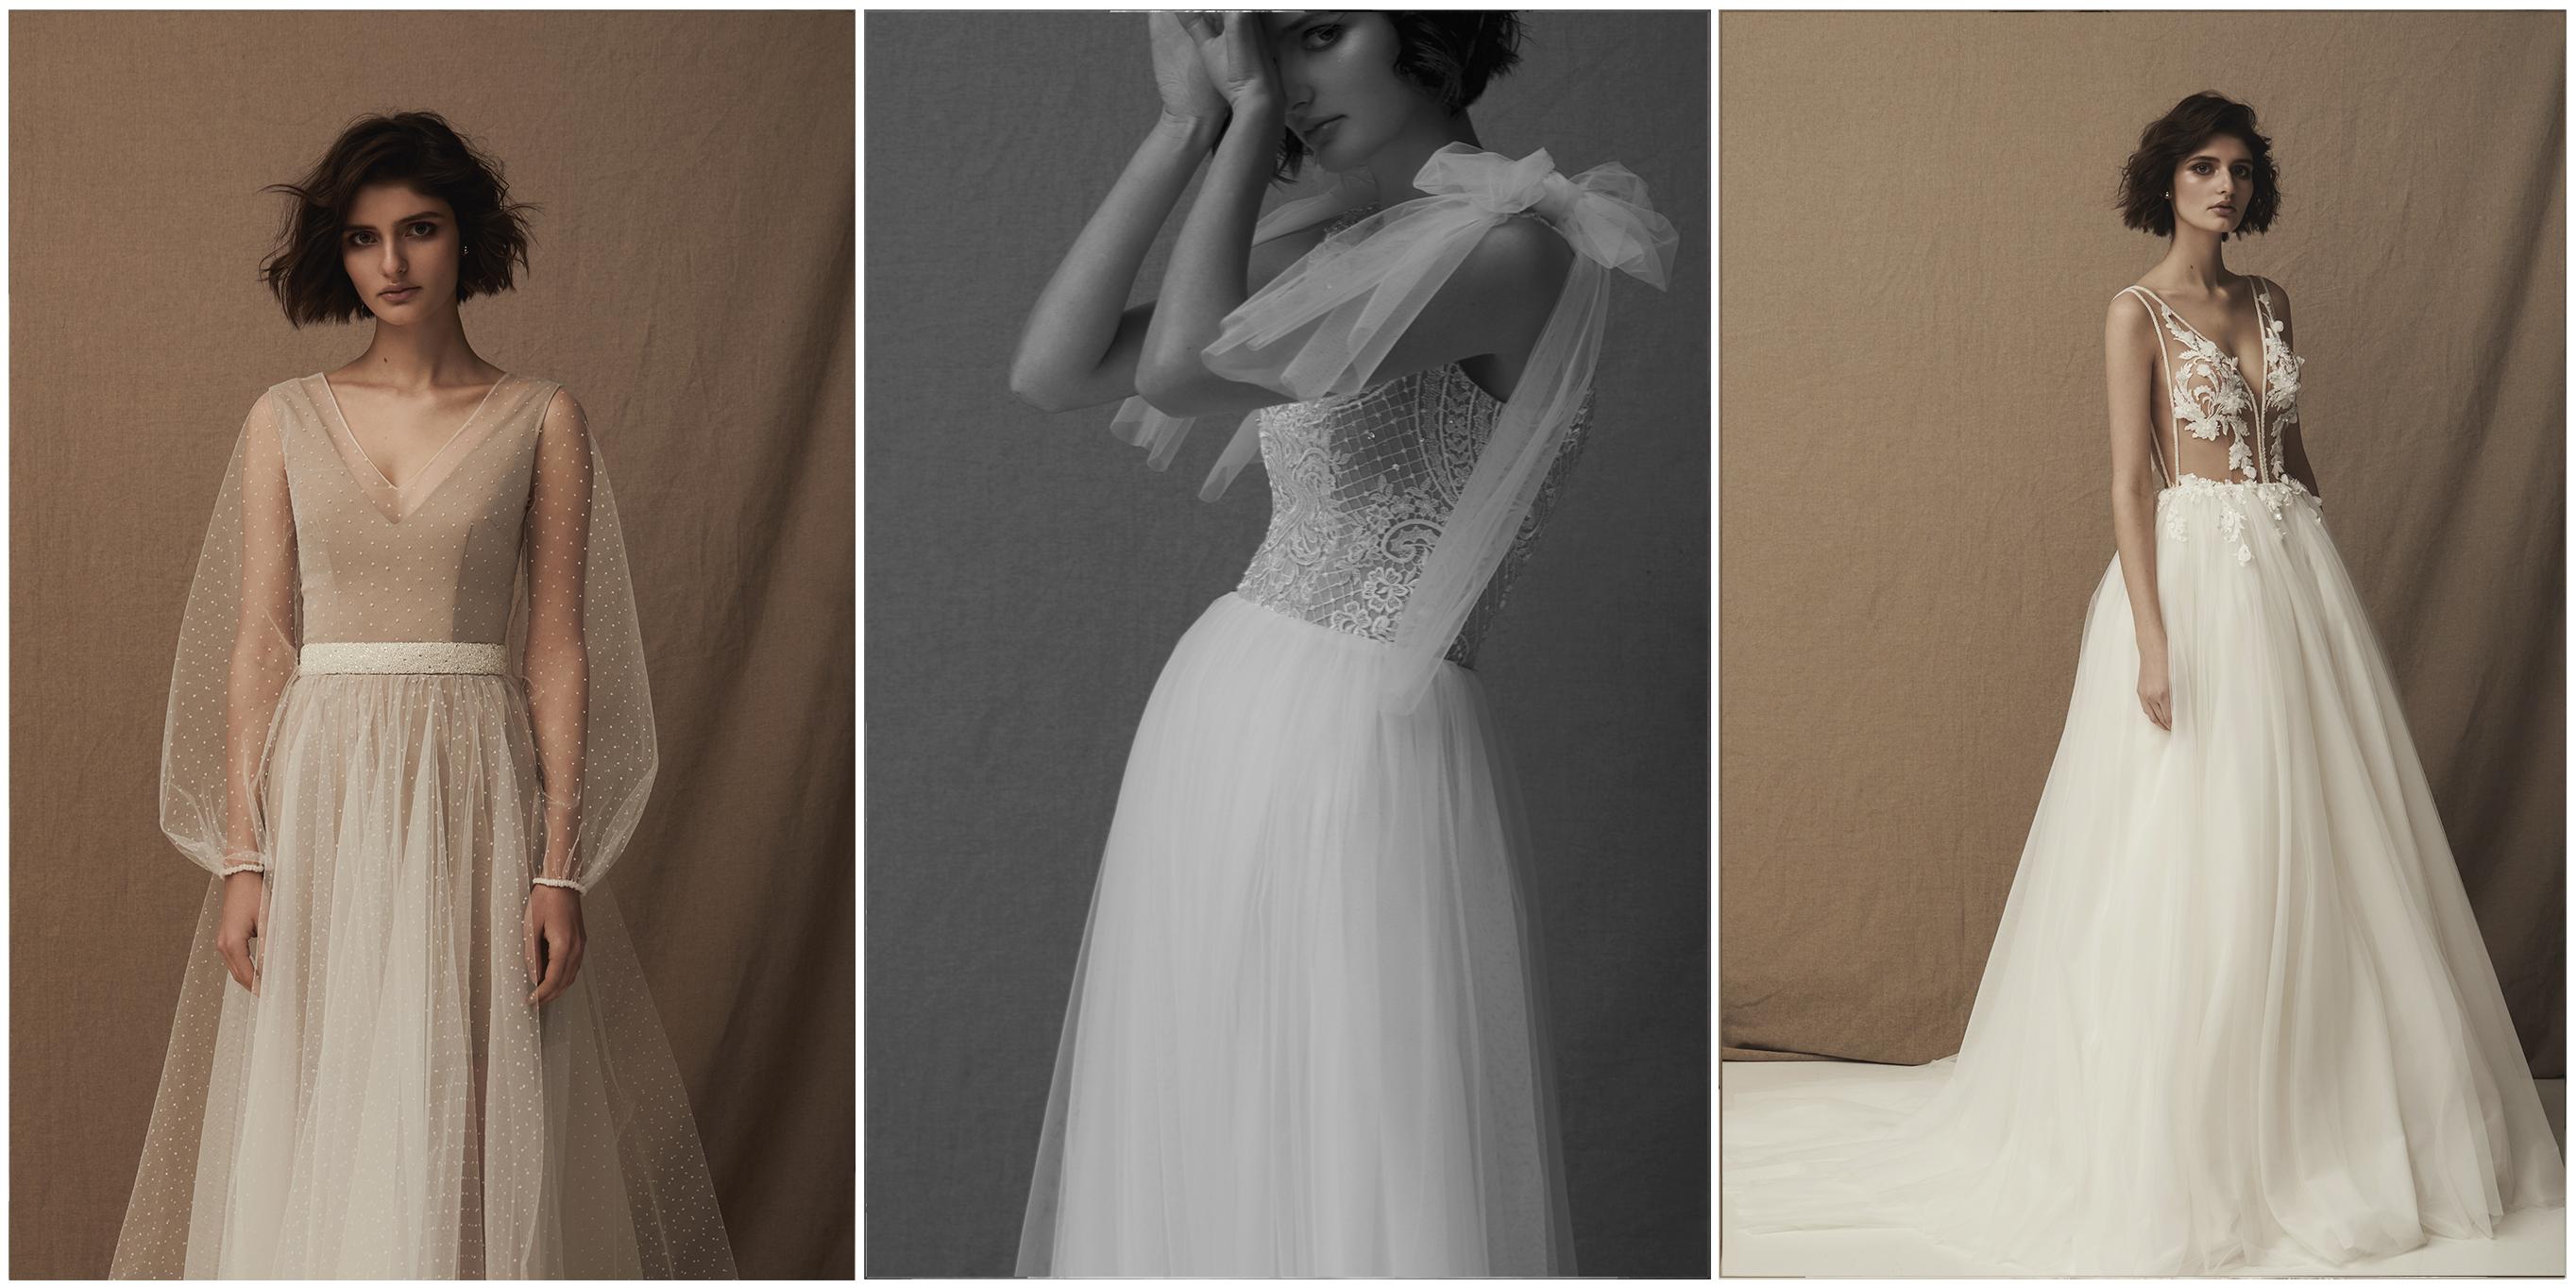 68f416399e6 Новая bridal коллекция СВАДЕБНЫХ ПЛАТЬЕВ TOTAL WHITE - Feelings. Total White  - FEELINGS - 1